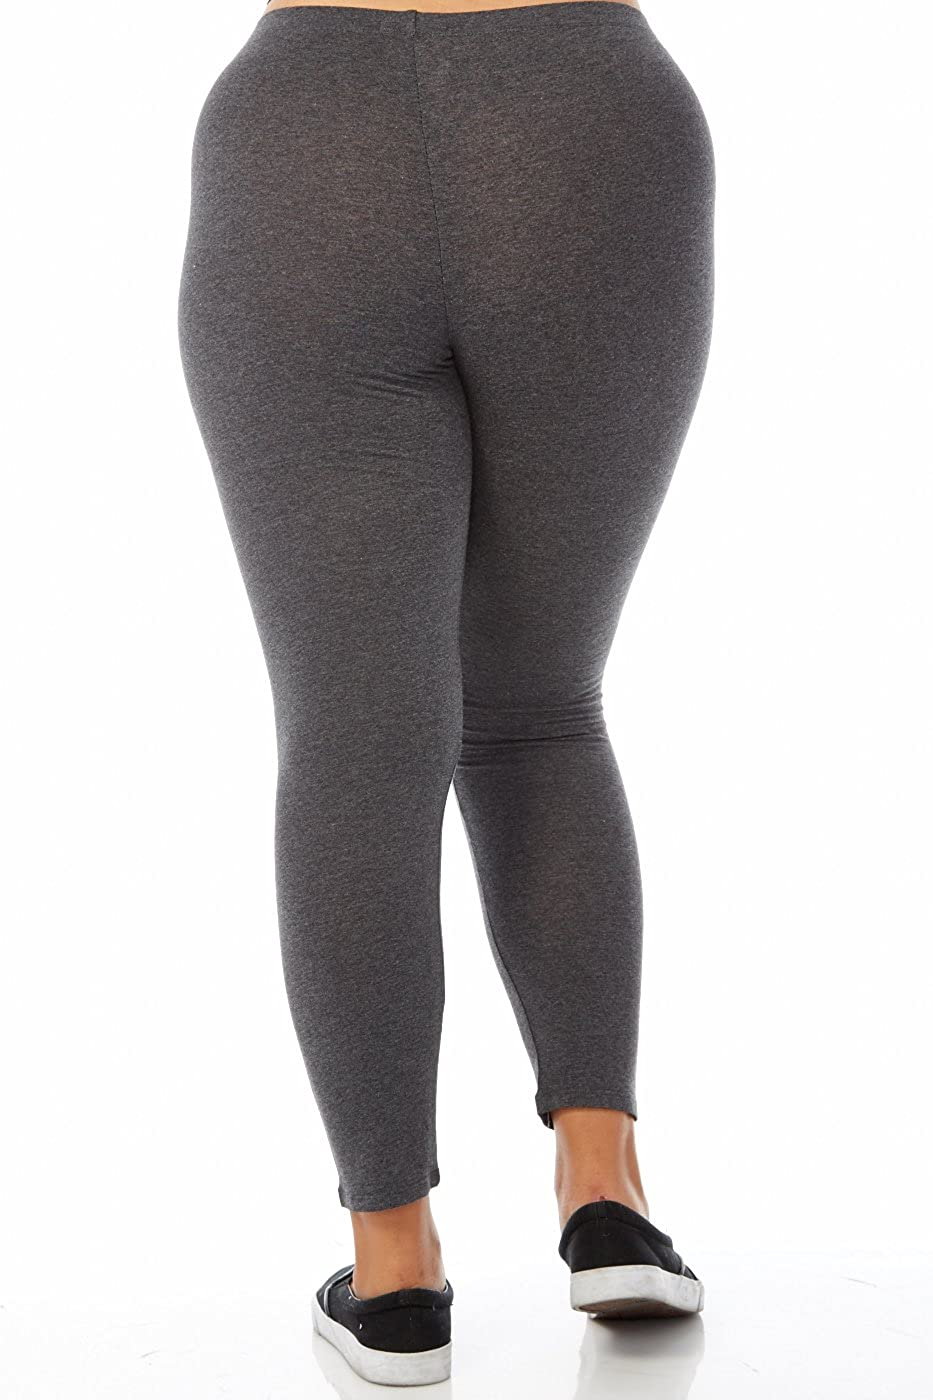 e12eb52fcf2 Amazon.com  Bozzolo Plus Size Long Leggings (3xl